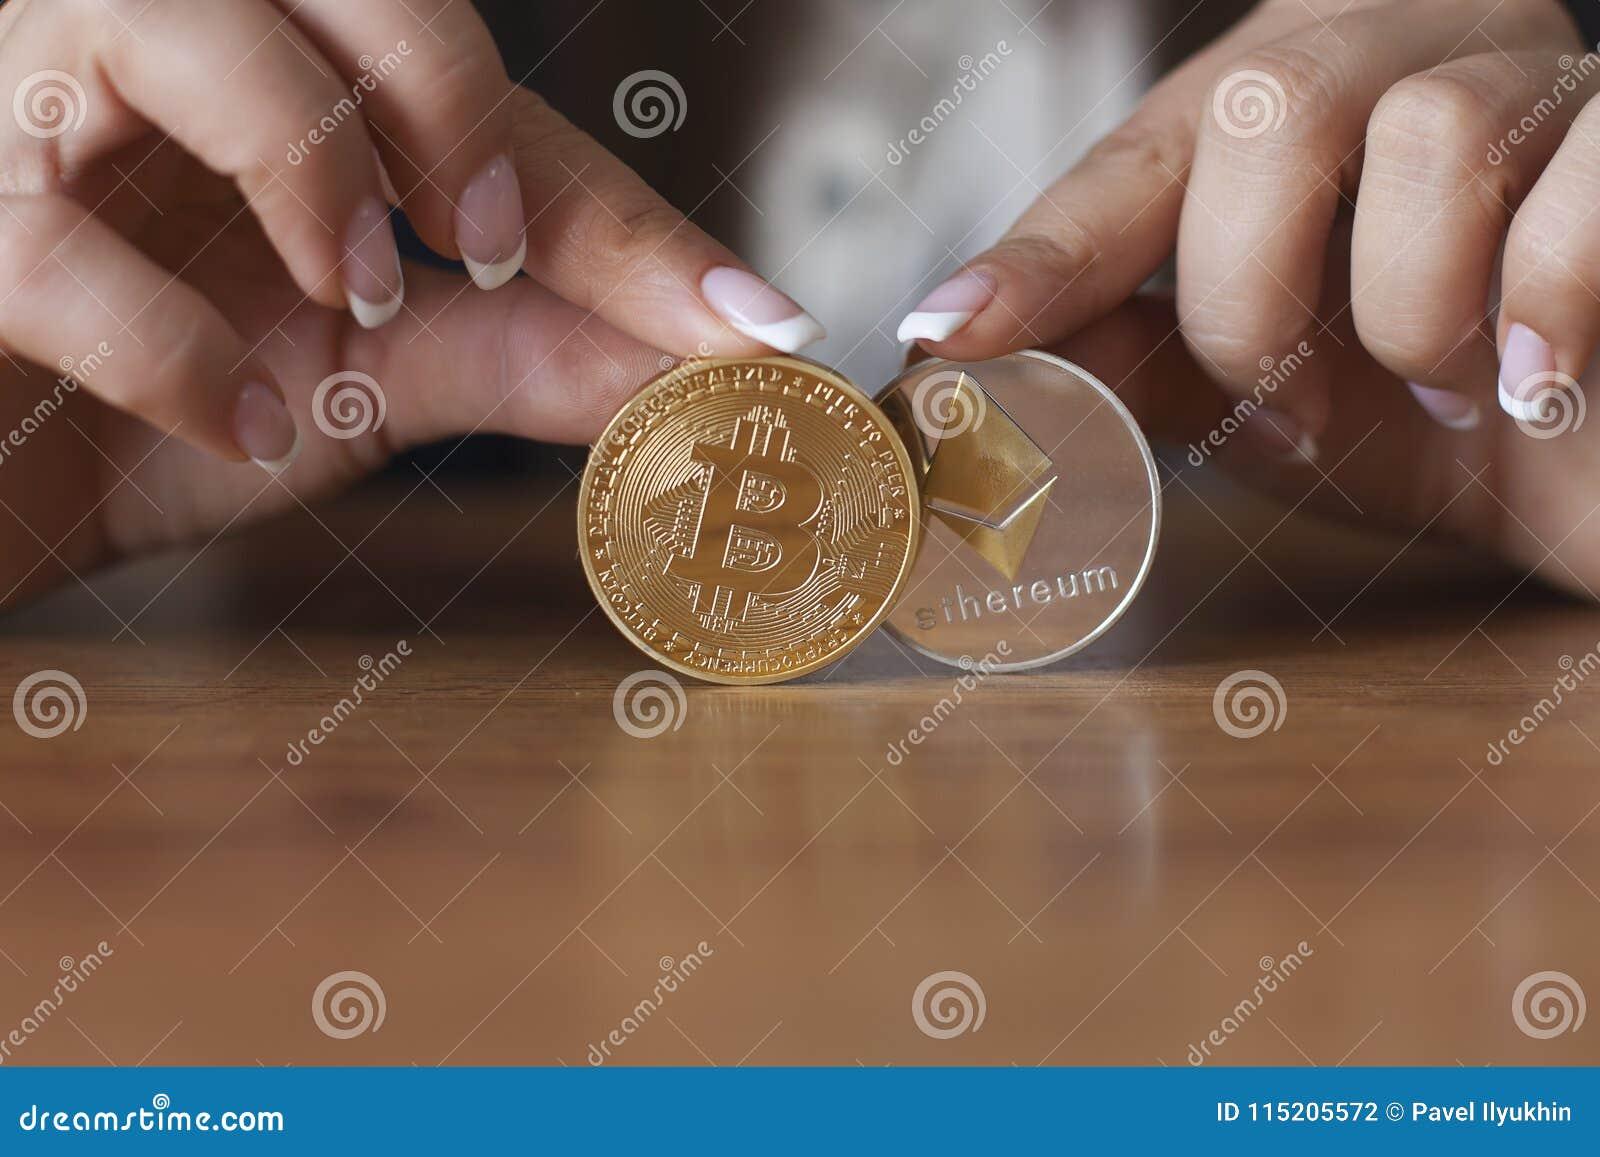 coin market platform